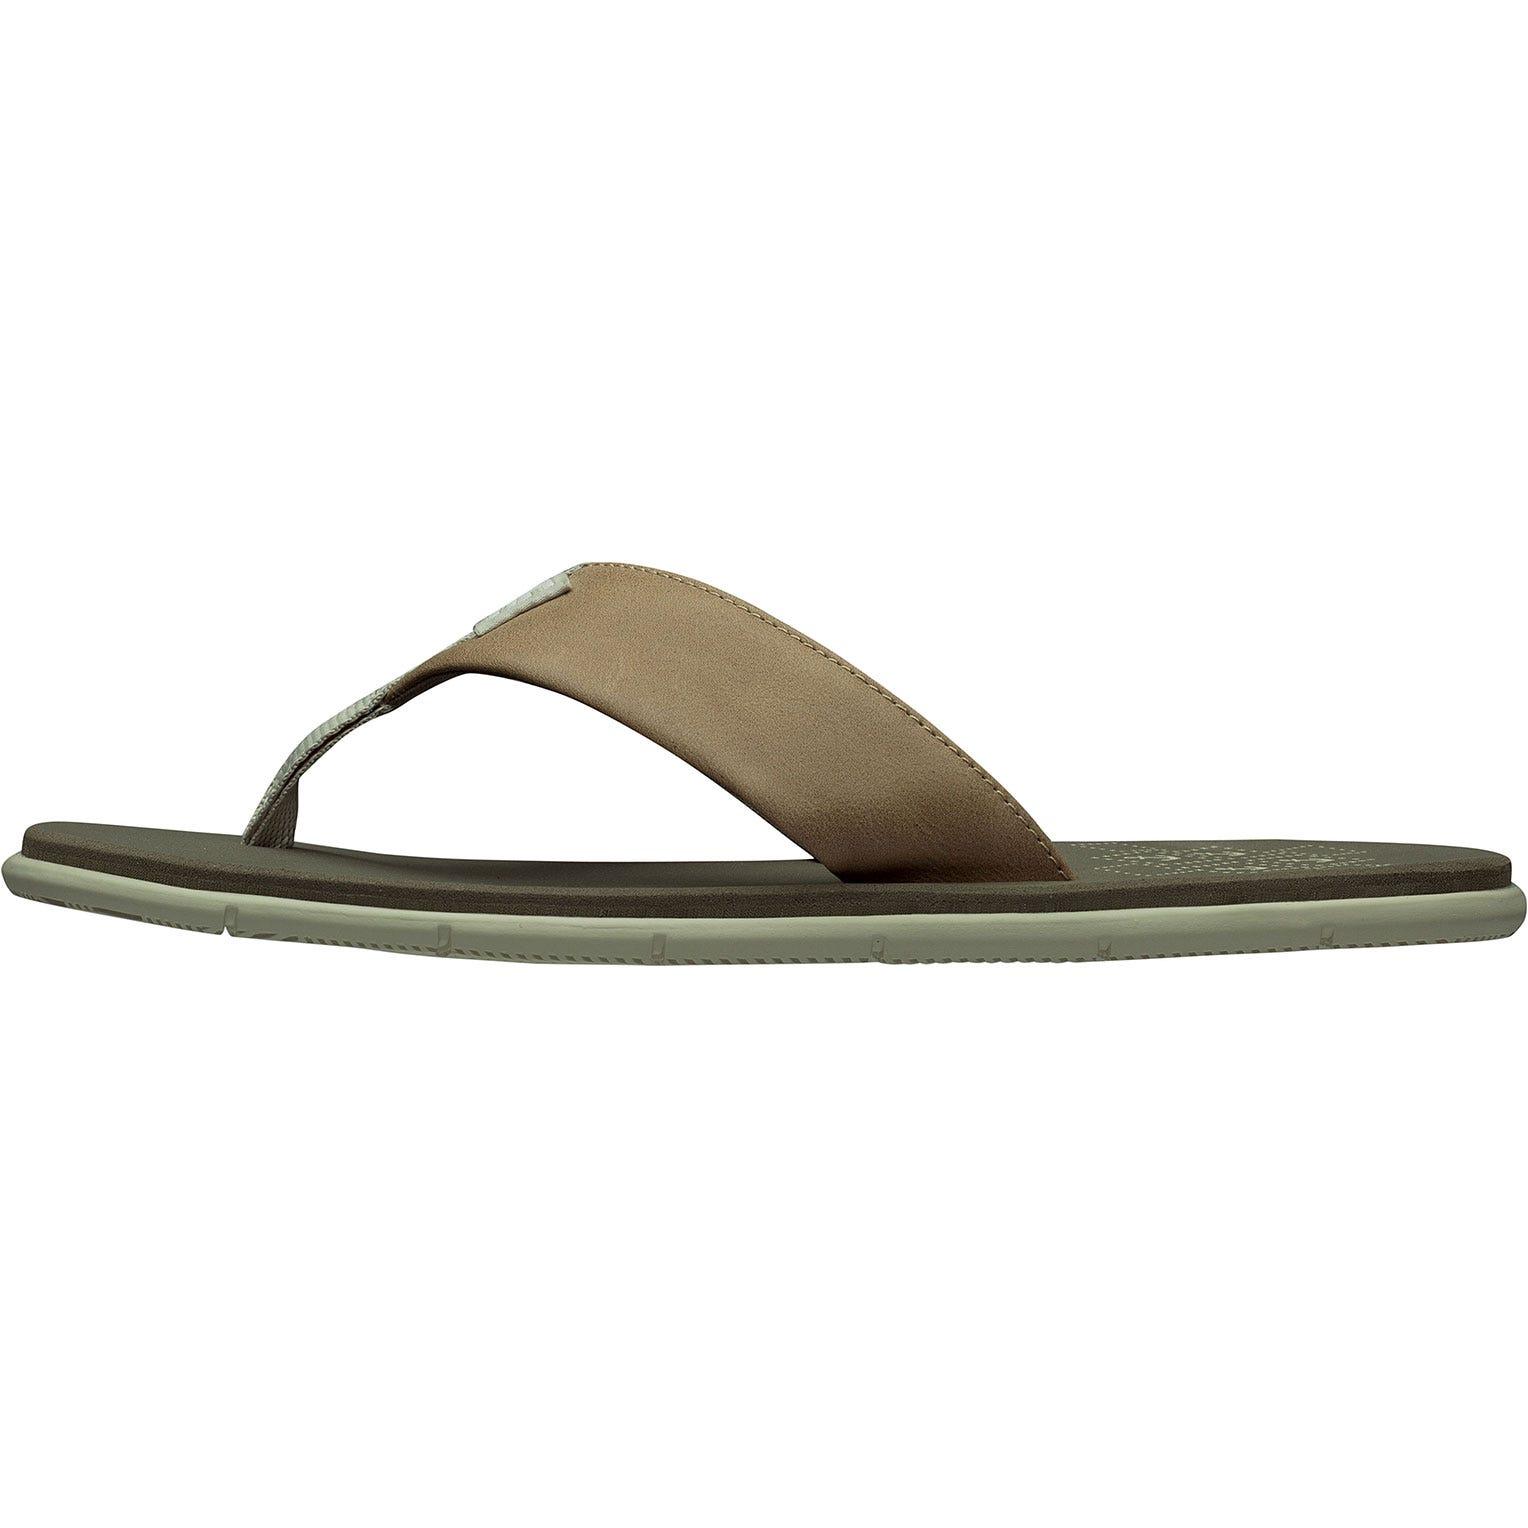 Helly Hansen W Seasand Leather Sandal Womens Beige 40.5/9